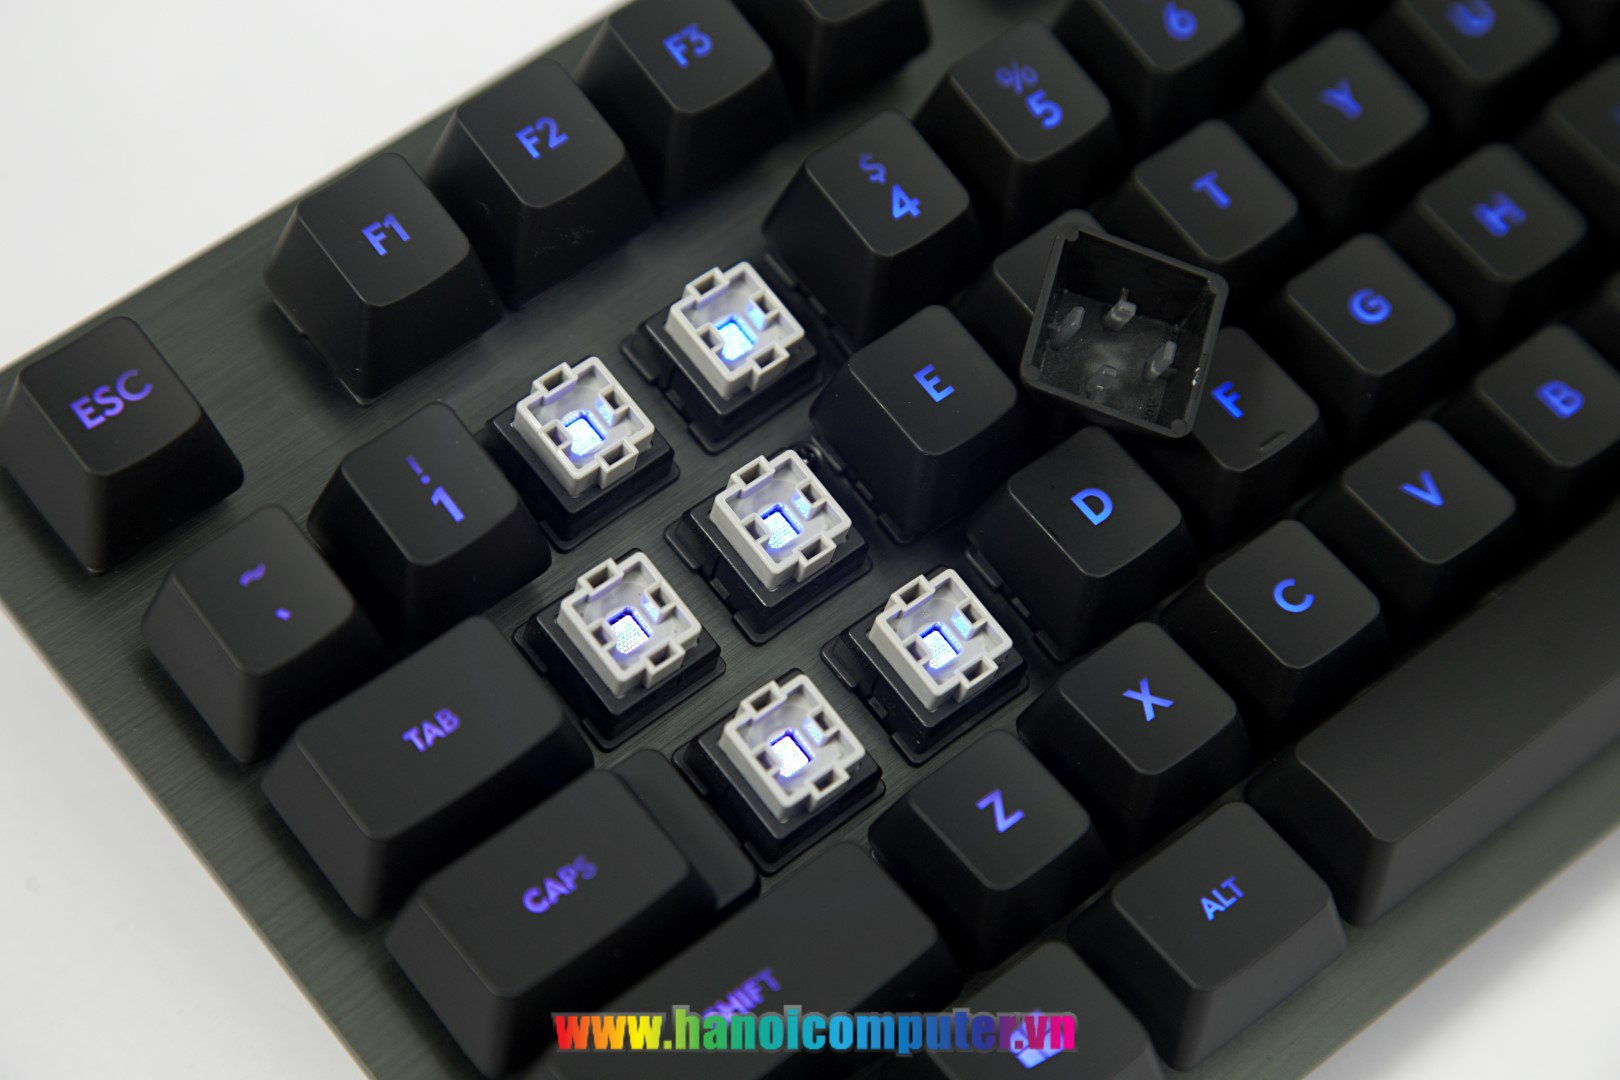 Keyboard Logitech G512 Rgb Mechanical Romer G Tactile Switch Gaming Gx Blue Carbon C Ra Mt Vi 2 Loi Tnh Khc Nhau Nu Nh Trc Y Ni Ti Gchng Ta Ch Quen